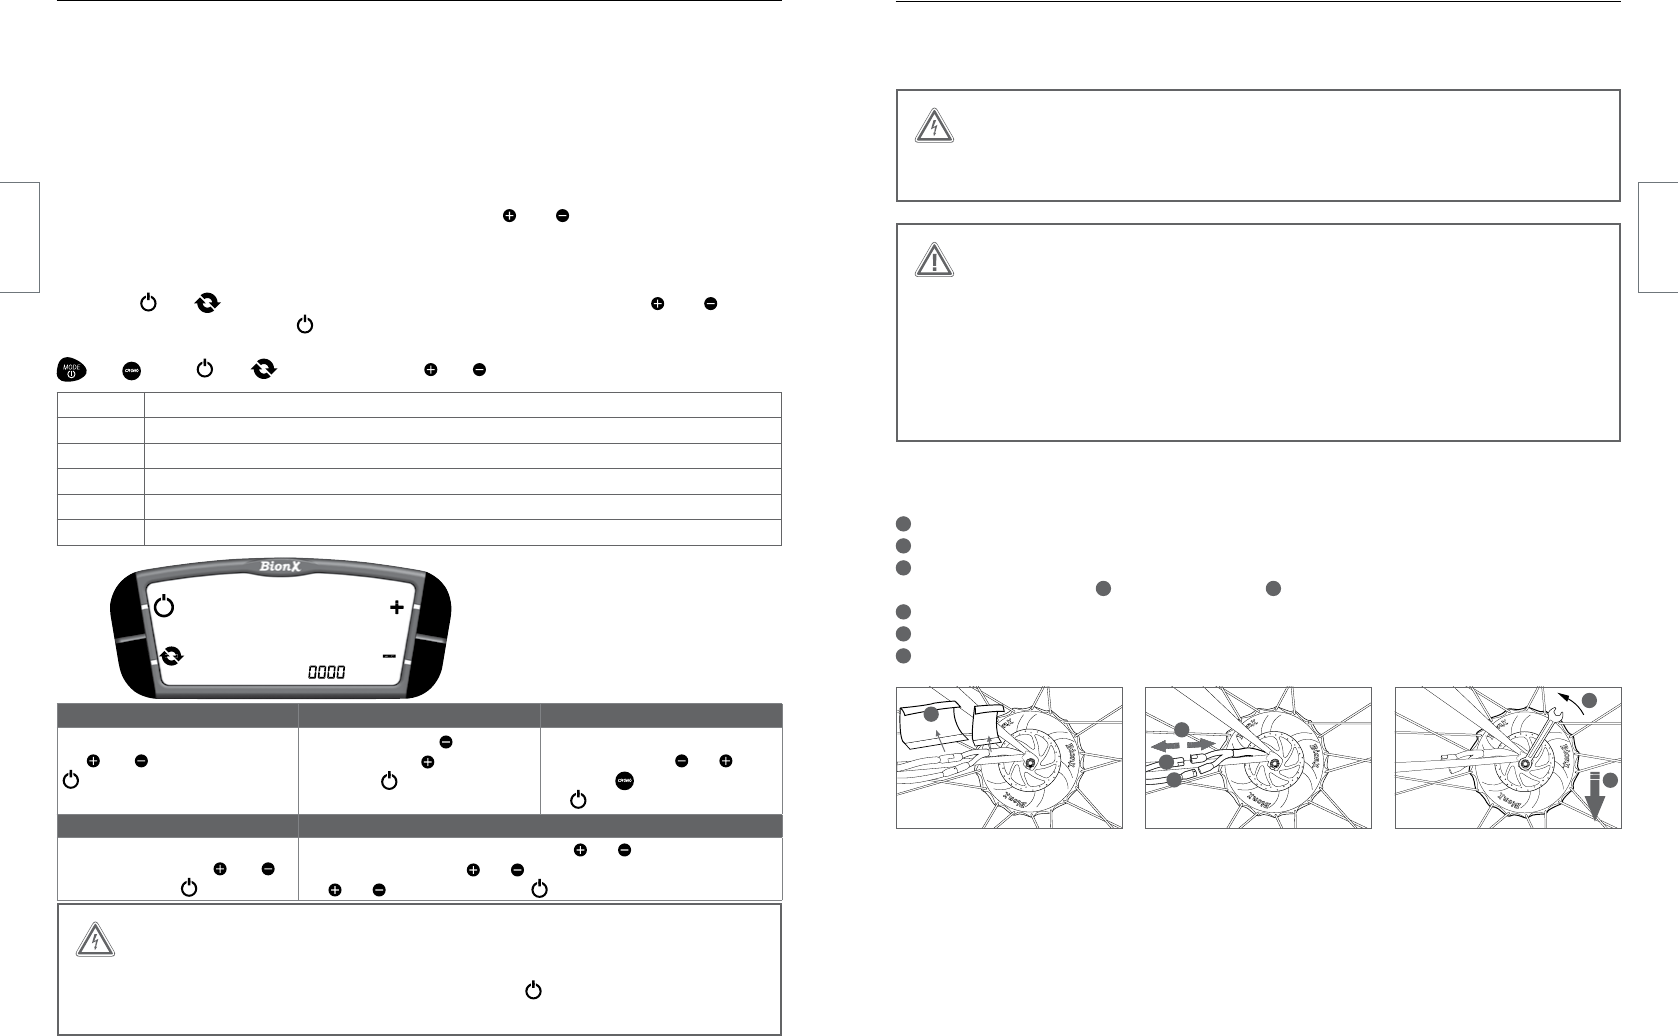 Handleiding BionX P-series (pagina 13 van 18) (Deutsch)